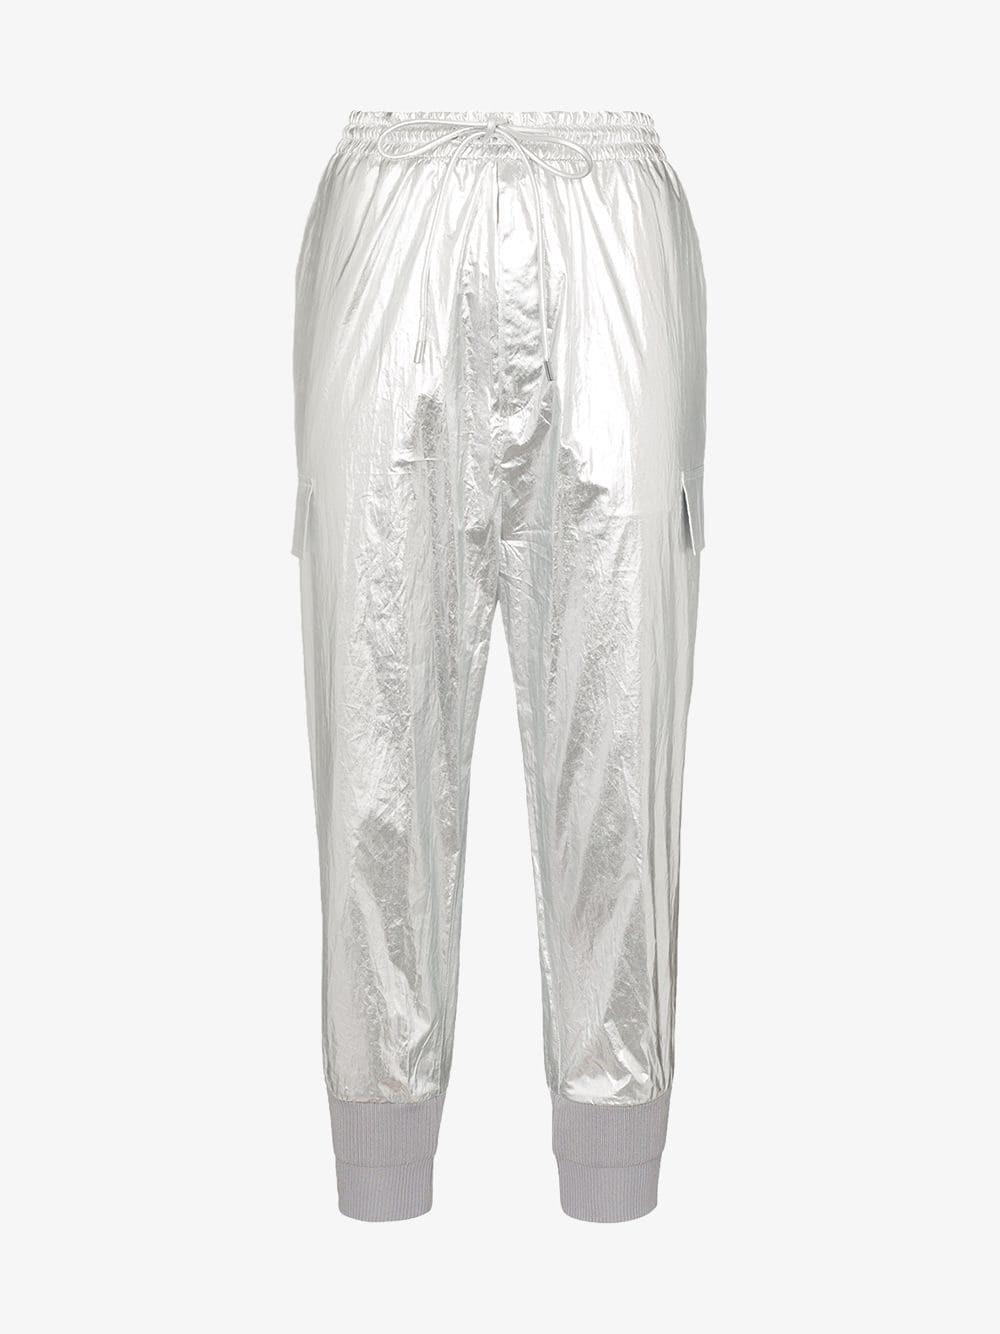 Juun.J contrast-cuff track pants in metallic